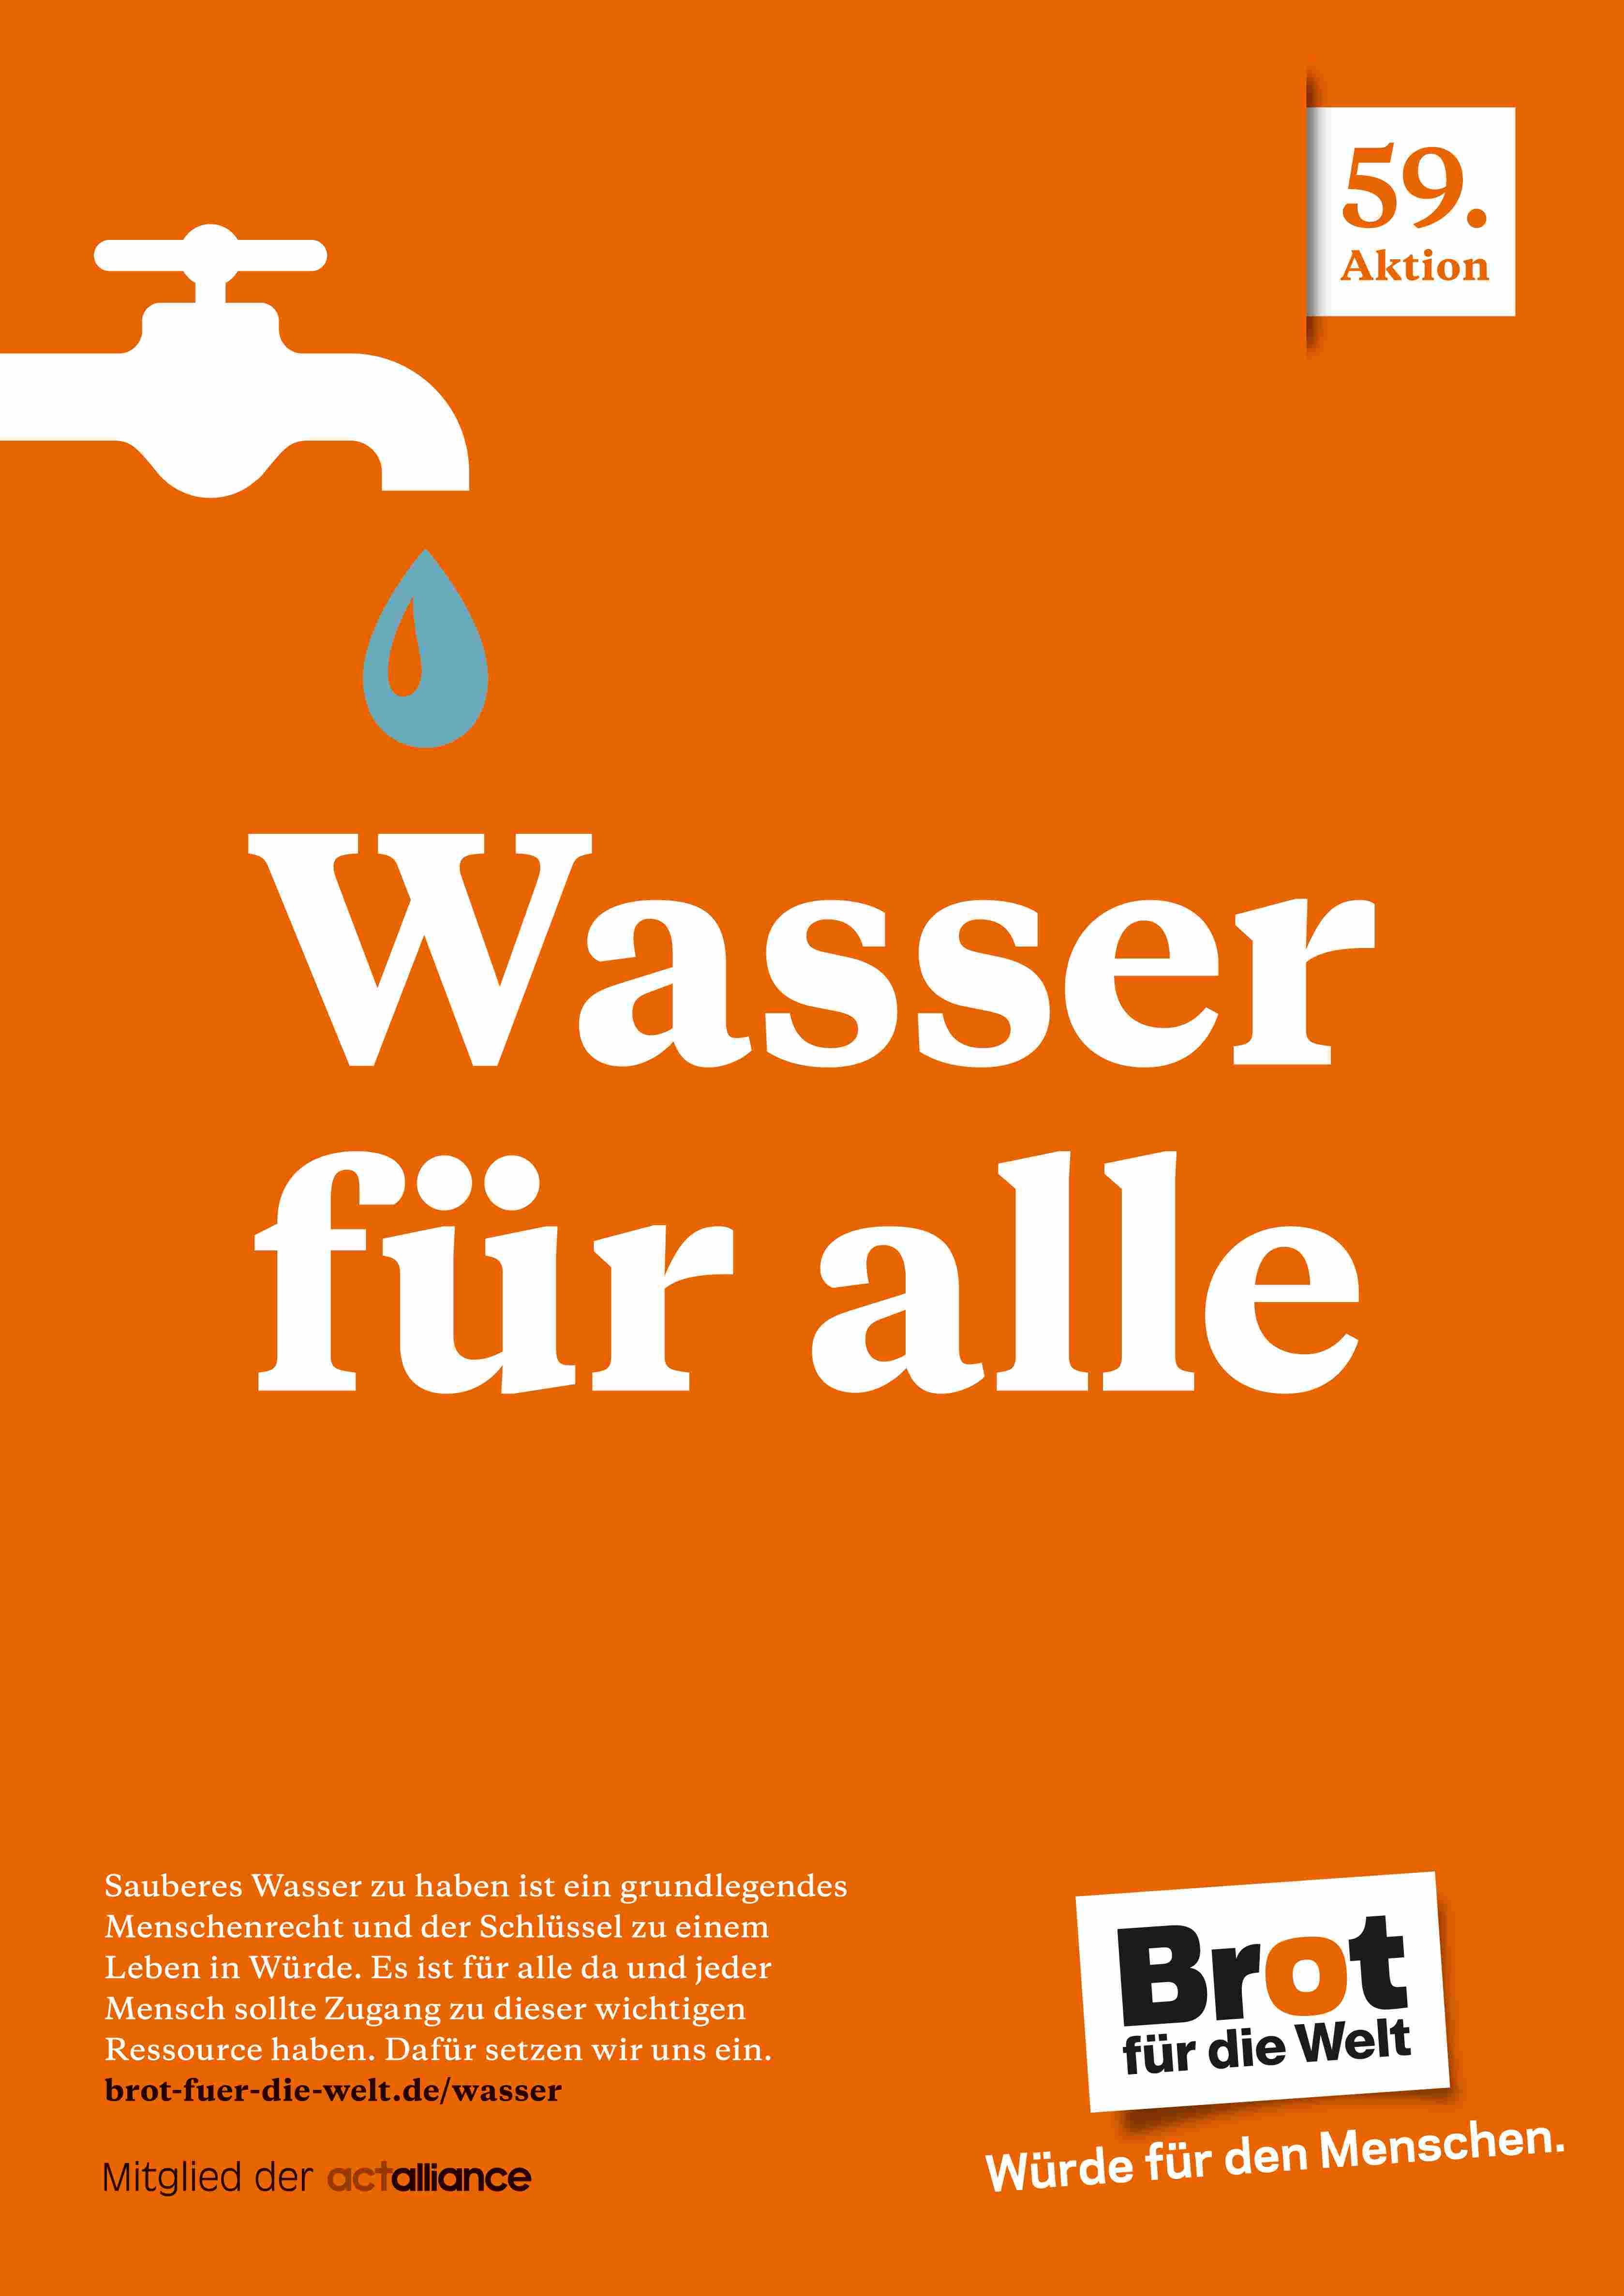 BfdW_Plakat_Aktion_Wasser_210x297mm_A4